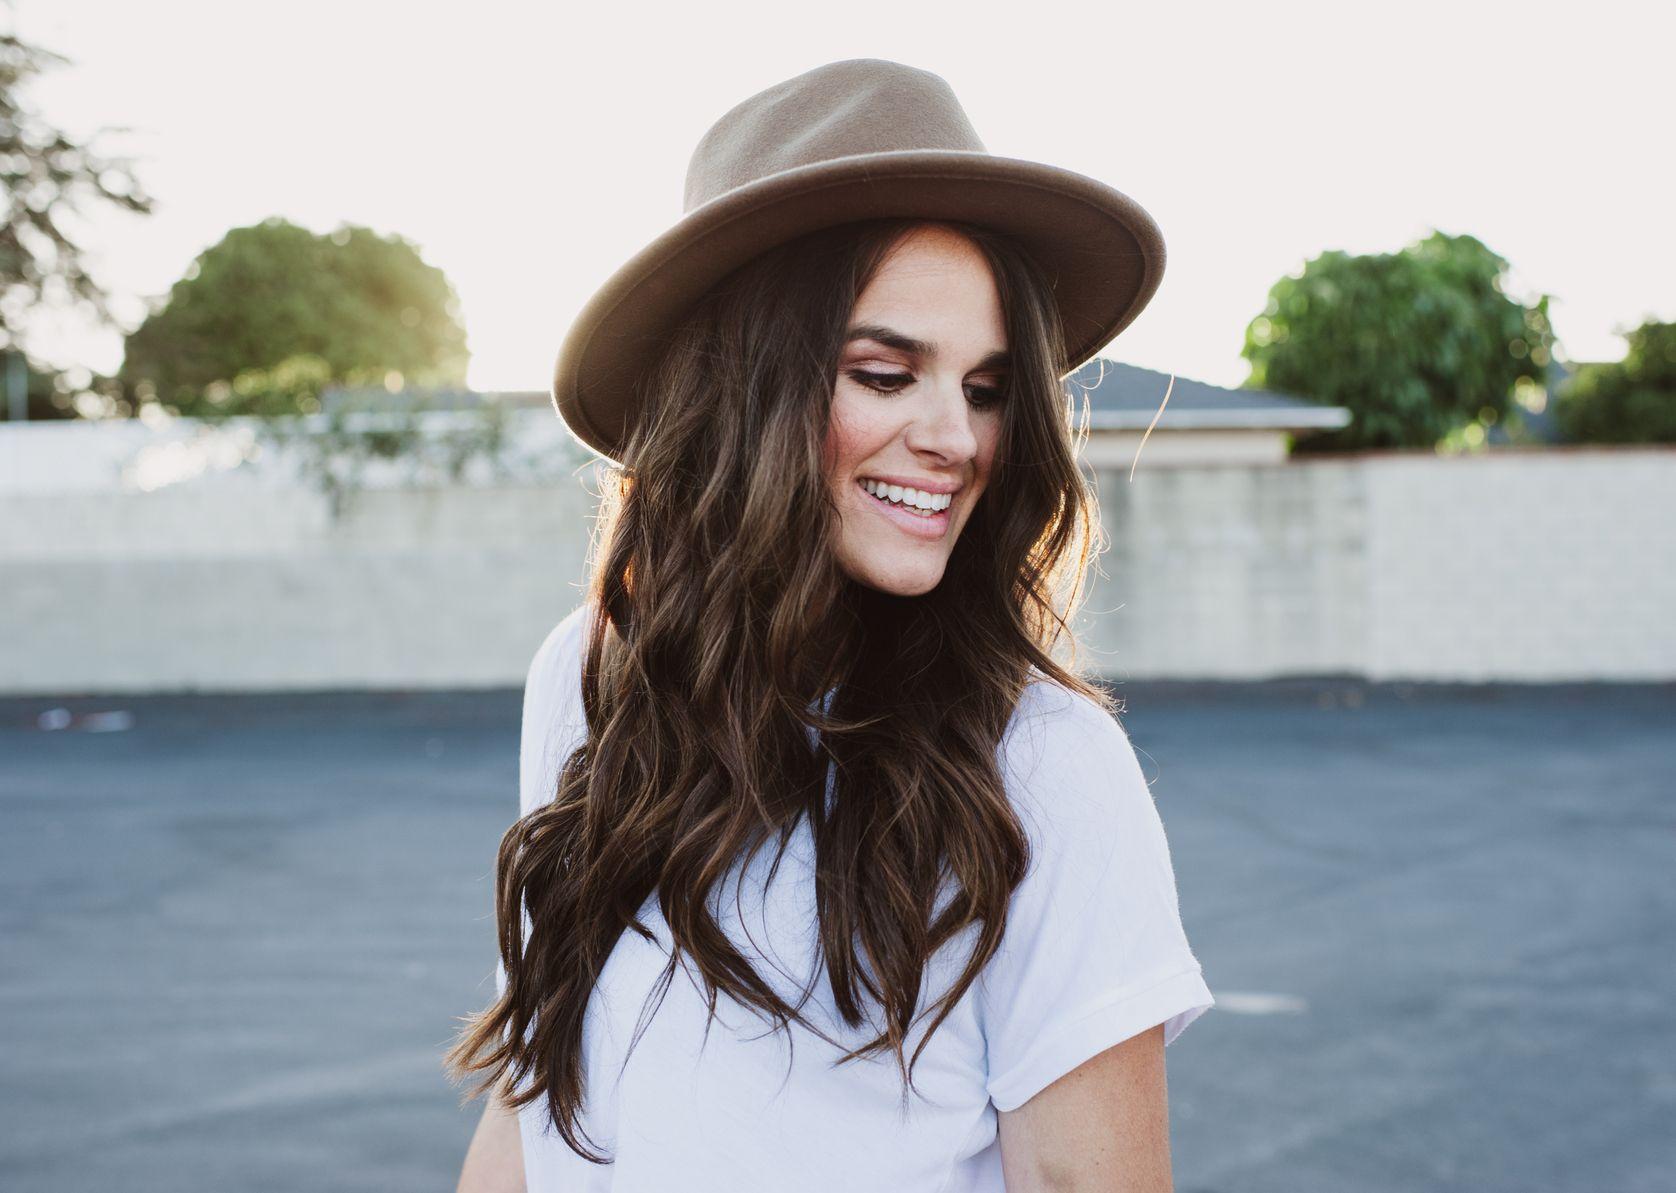 BRUNETTE SMILE WITH HAT.jpg